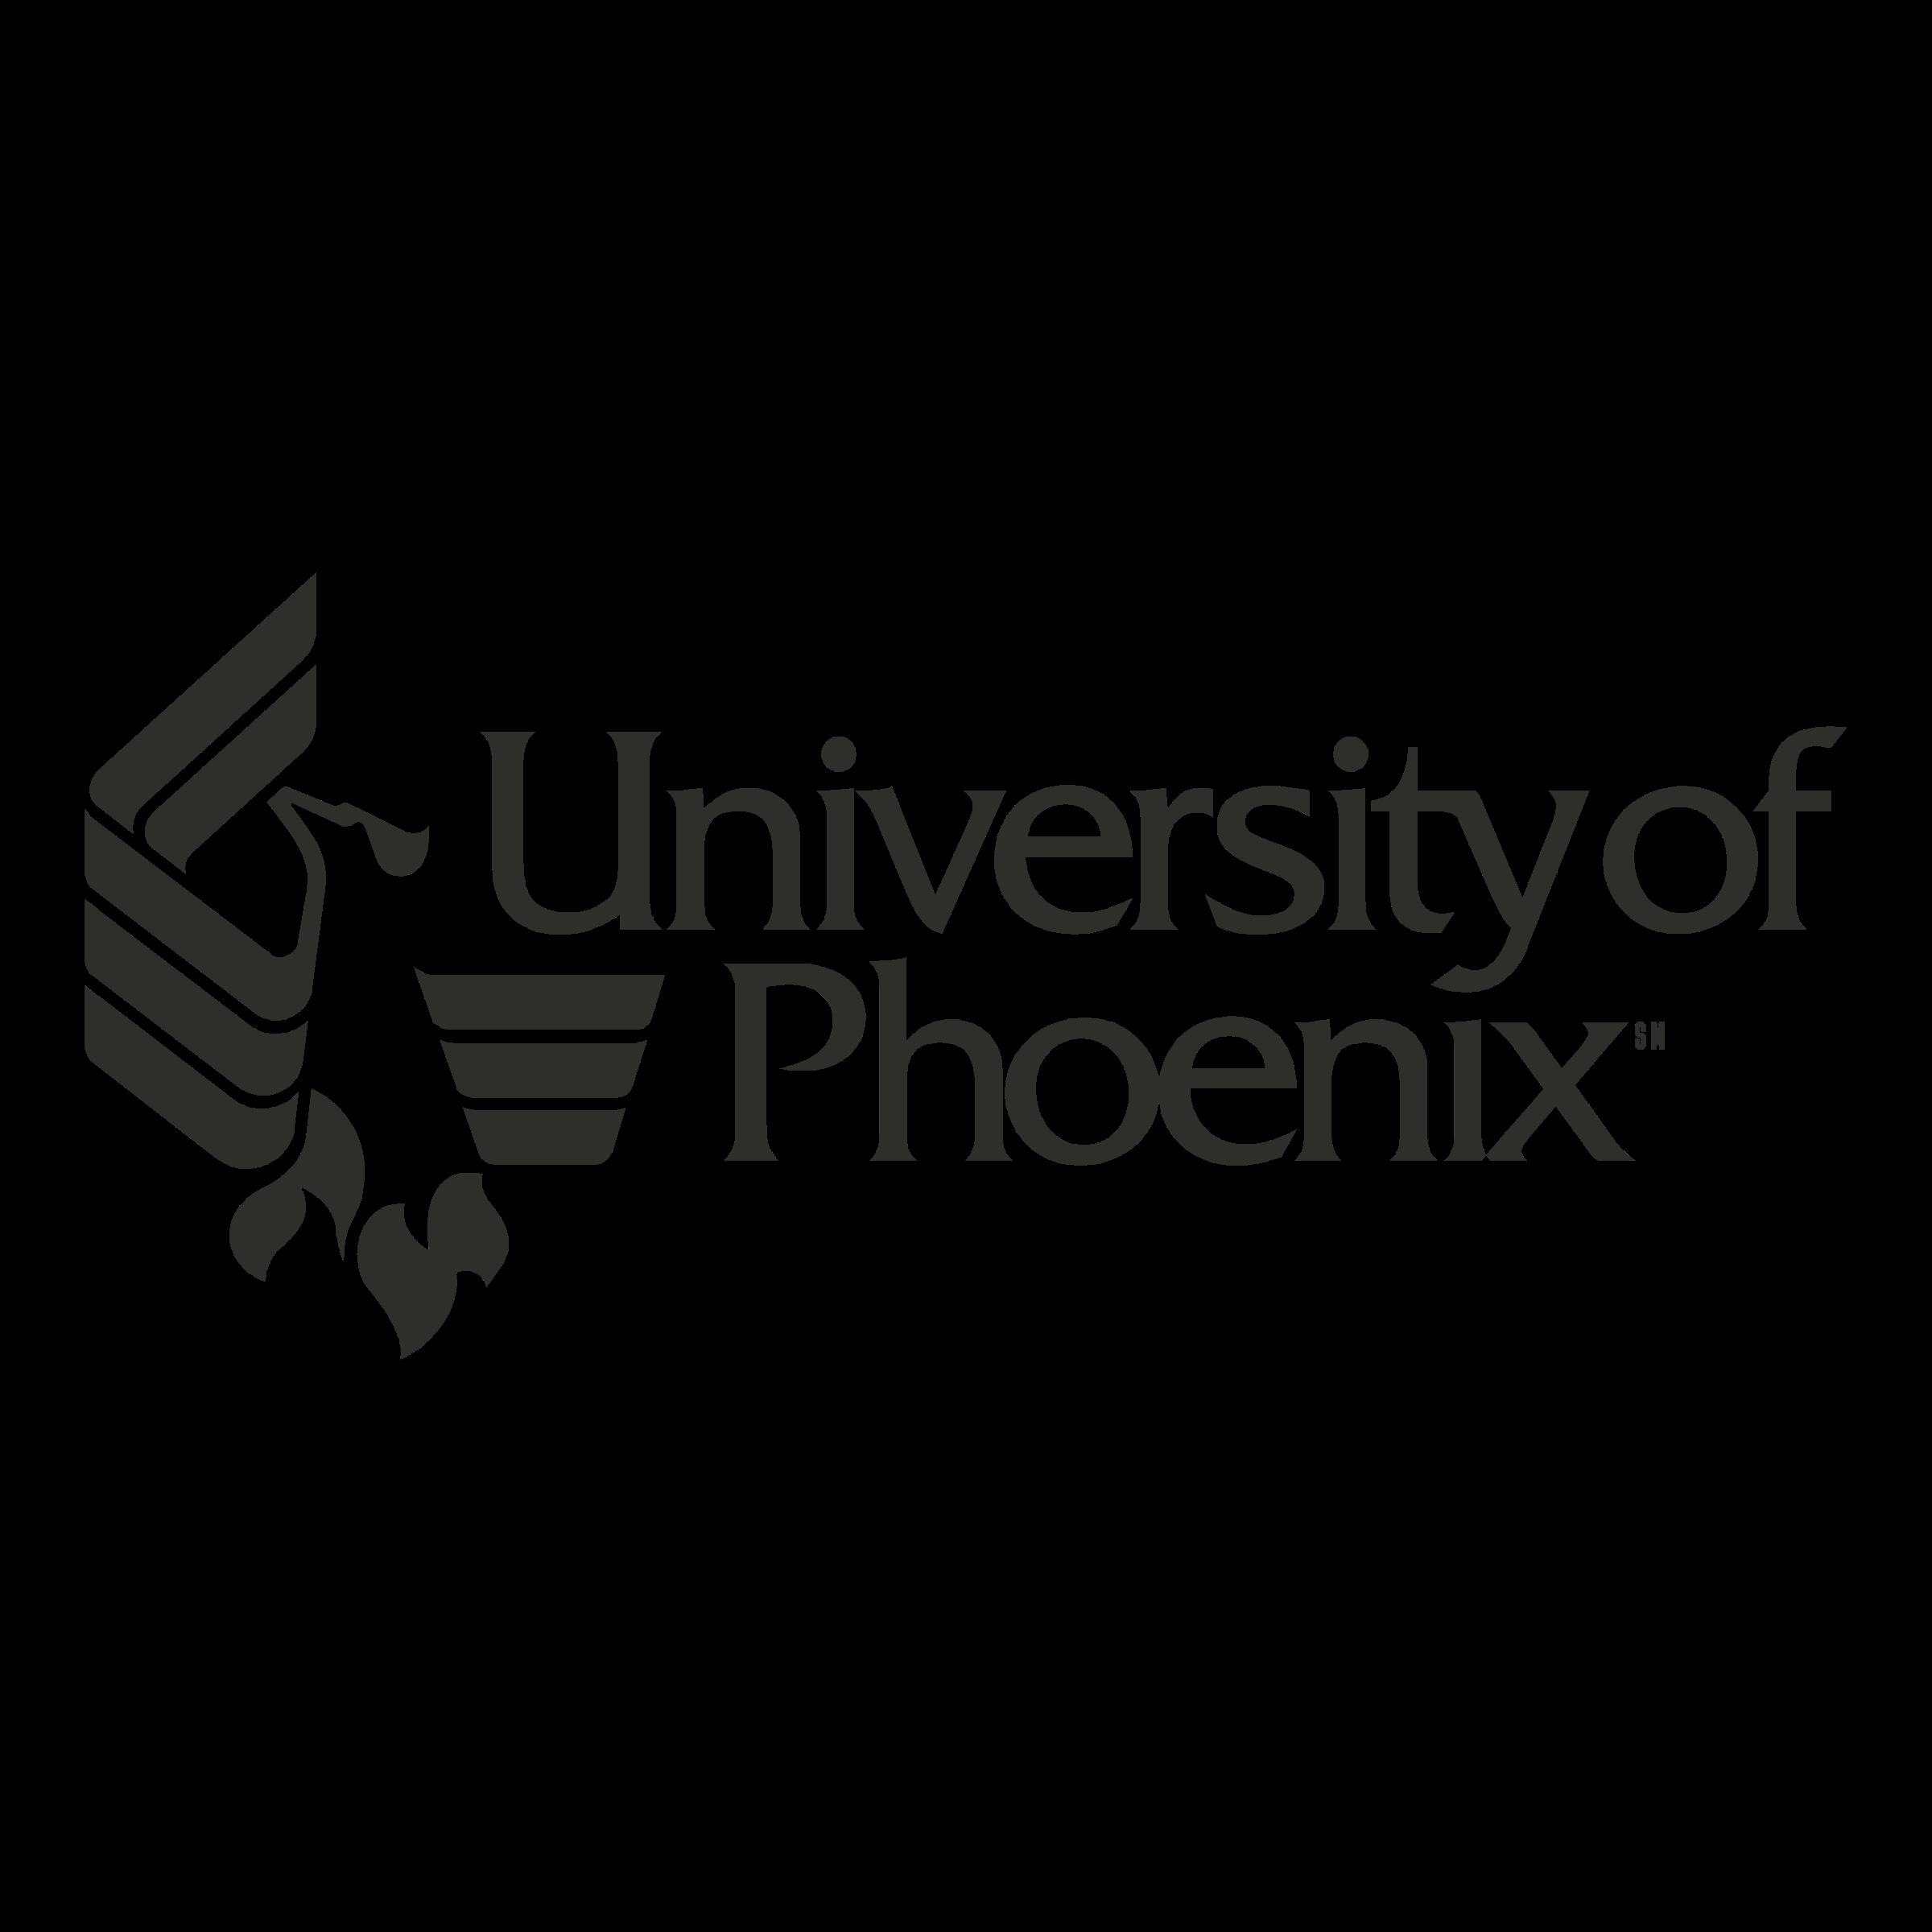 University of Phoenix Logo PNG Transparent & SVG Vector.